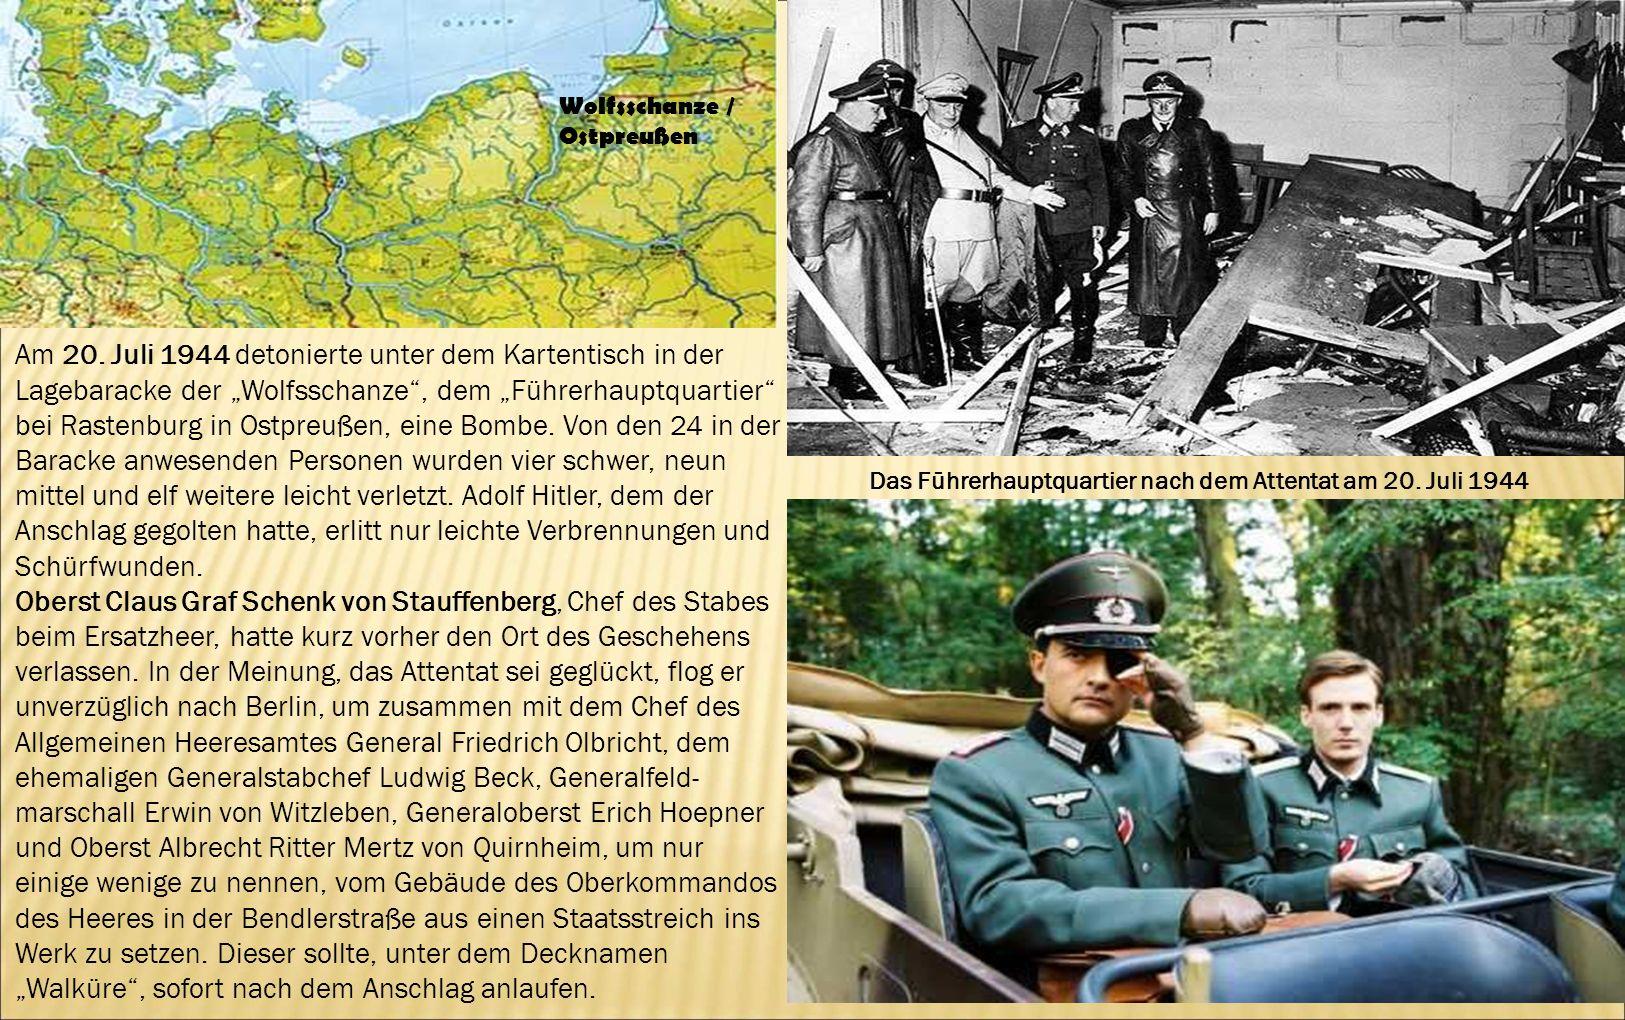 Das Führerhauptquartier nach dem Attentat am 20. Juli 1944